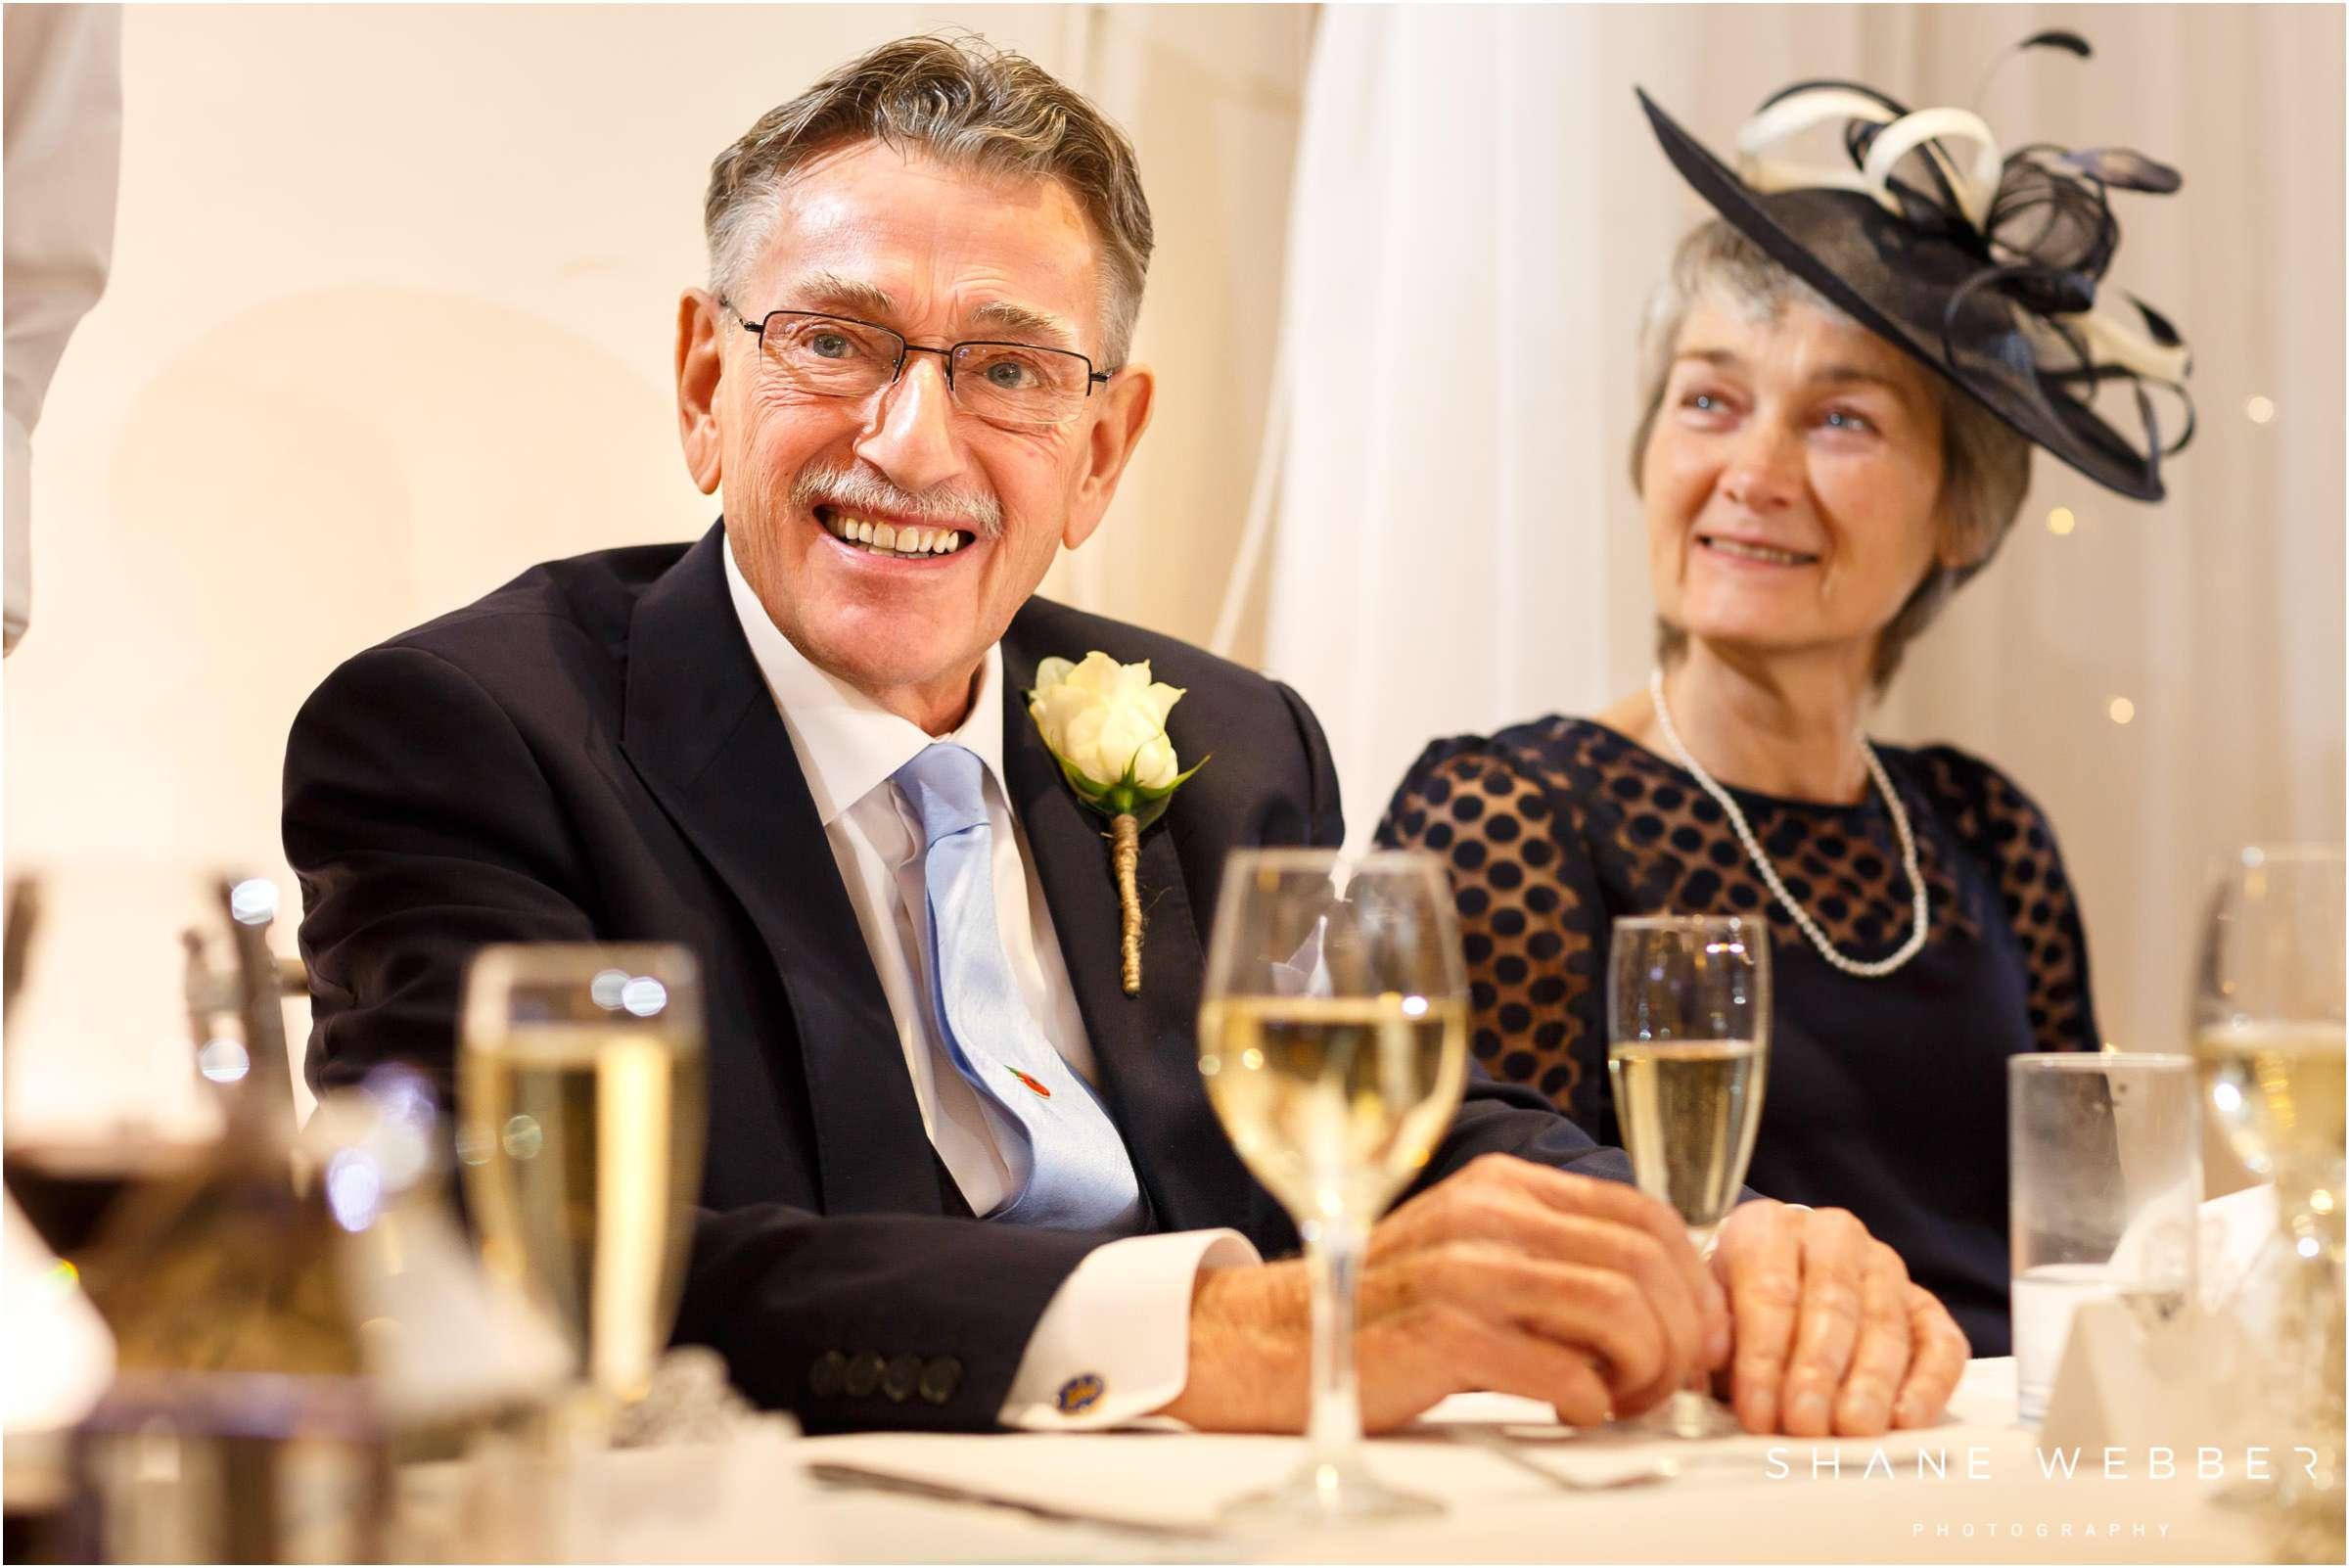 wedding guest photo